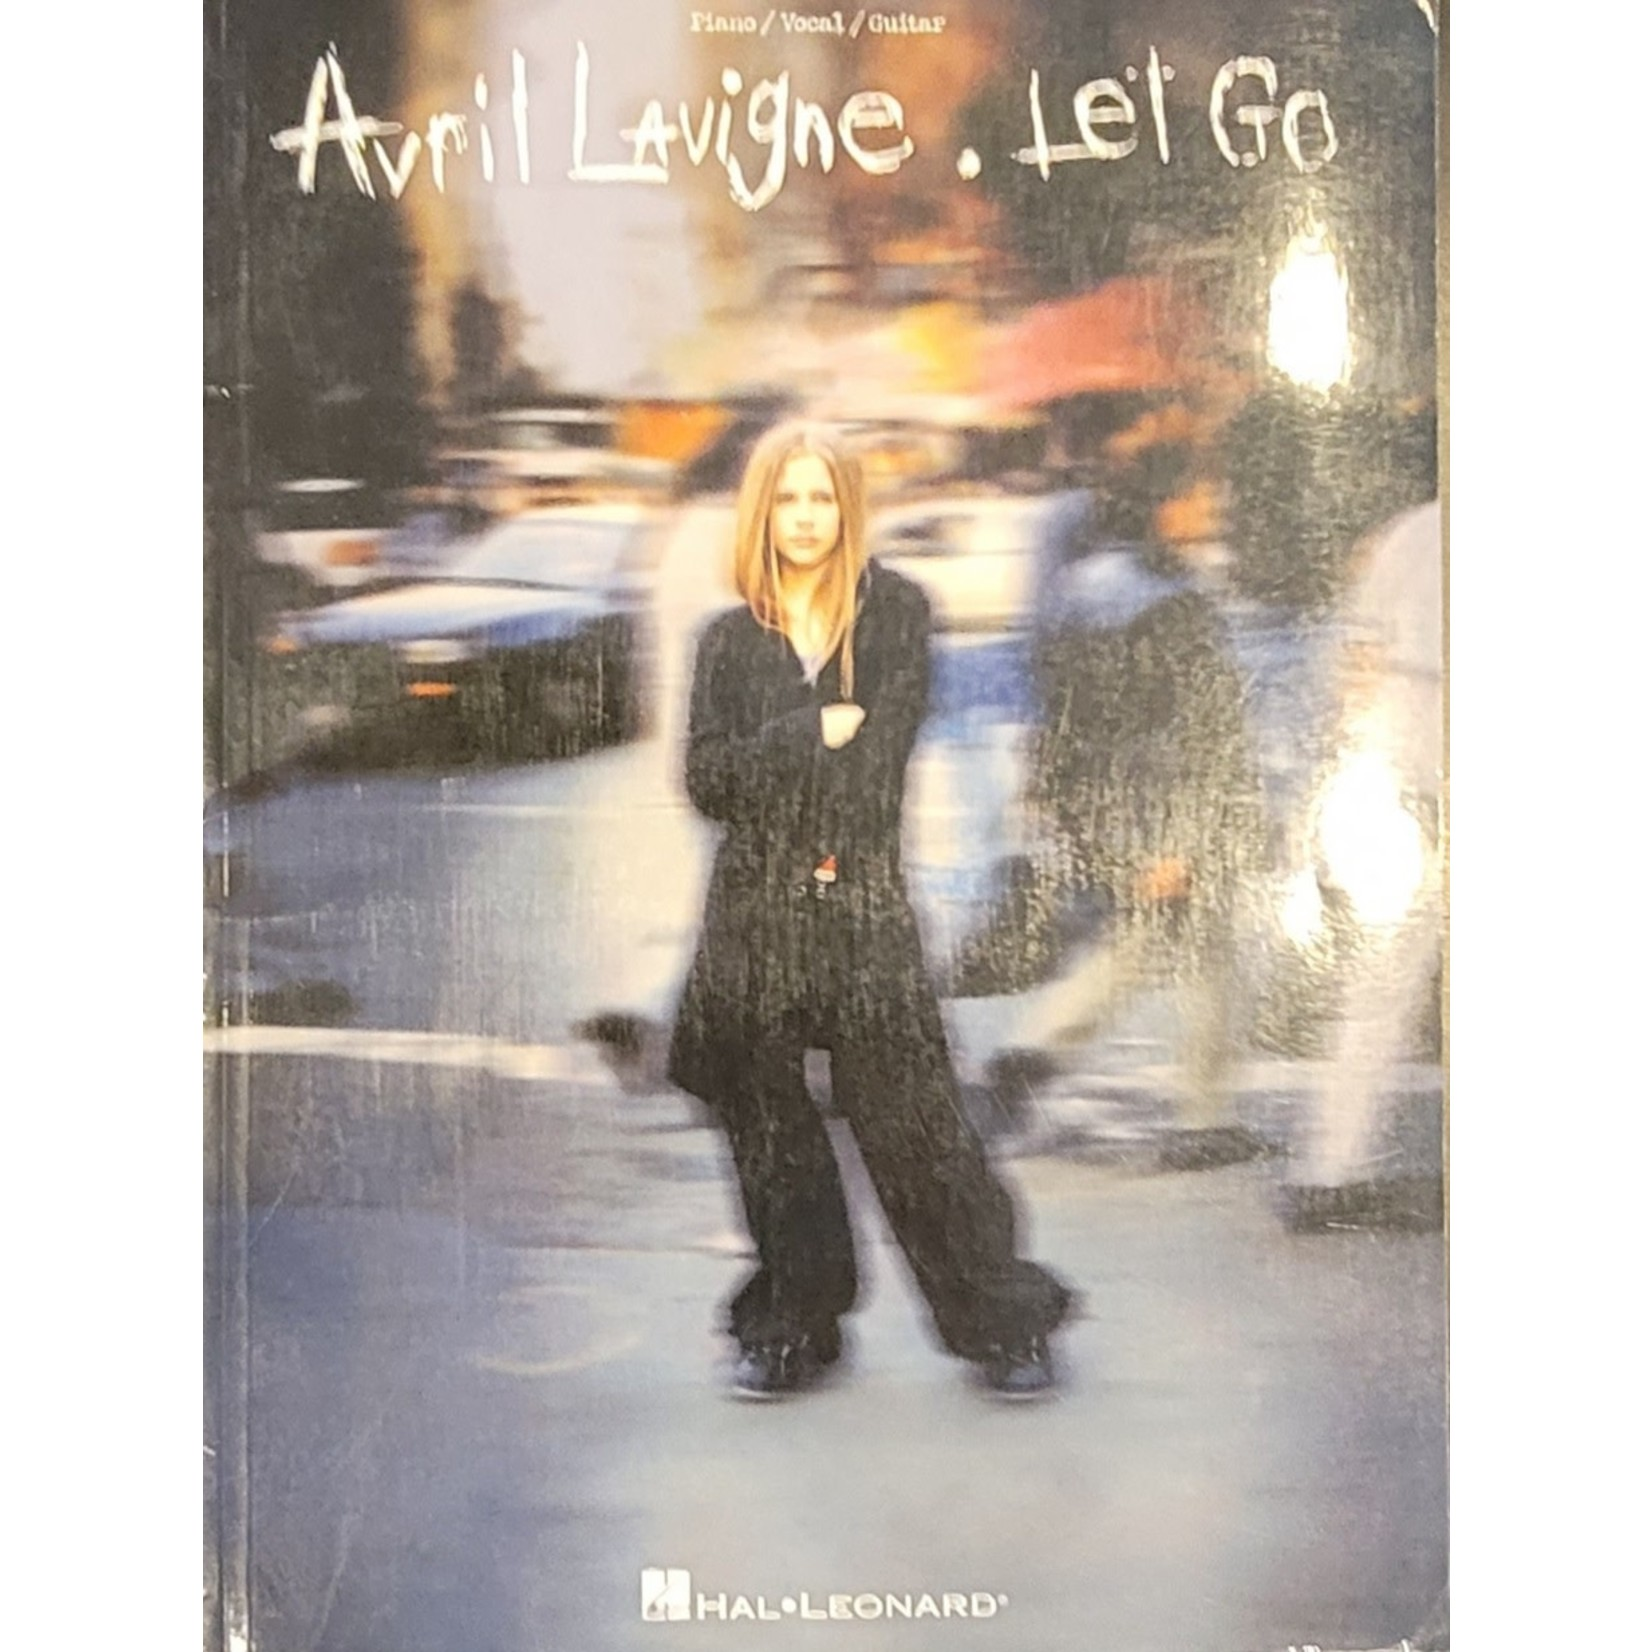 HAL LEONARD LIVRE LET GO/AVRIL LAVIGNE